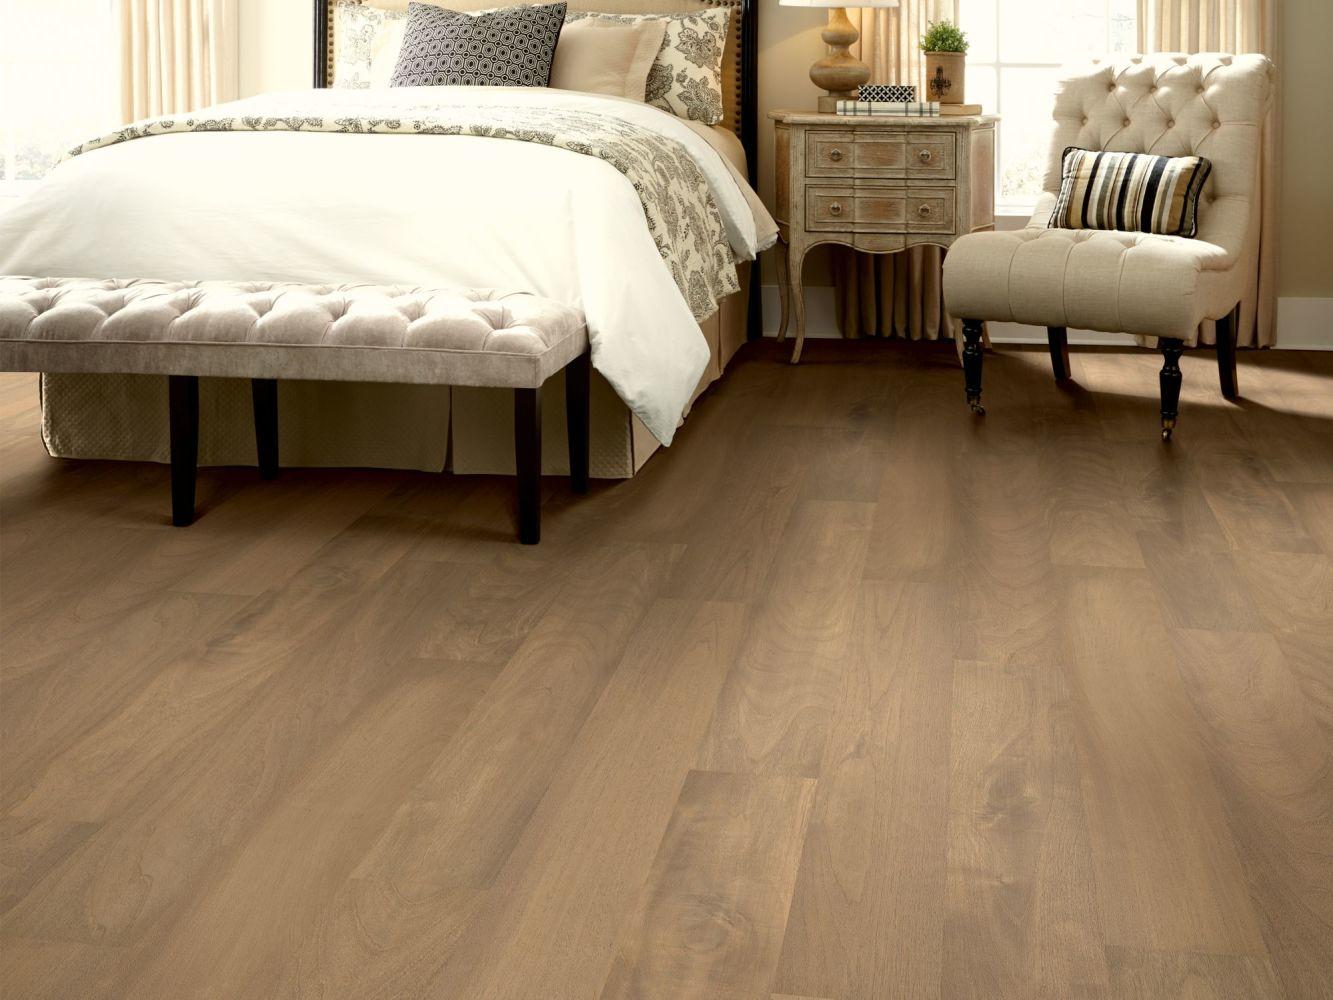 Shaw Floors Abbey Asc Rev Res Yukon Ridge Hdr Plus Mindful 06007_AF900